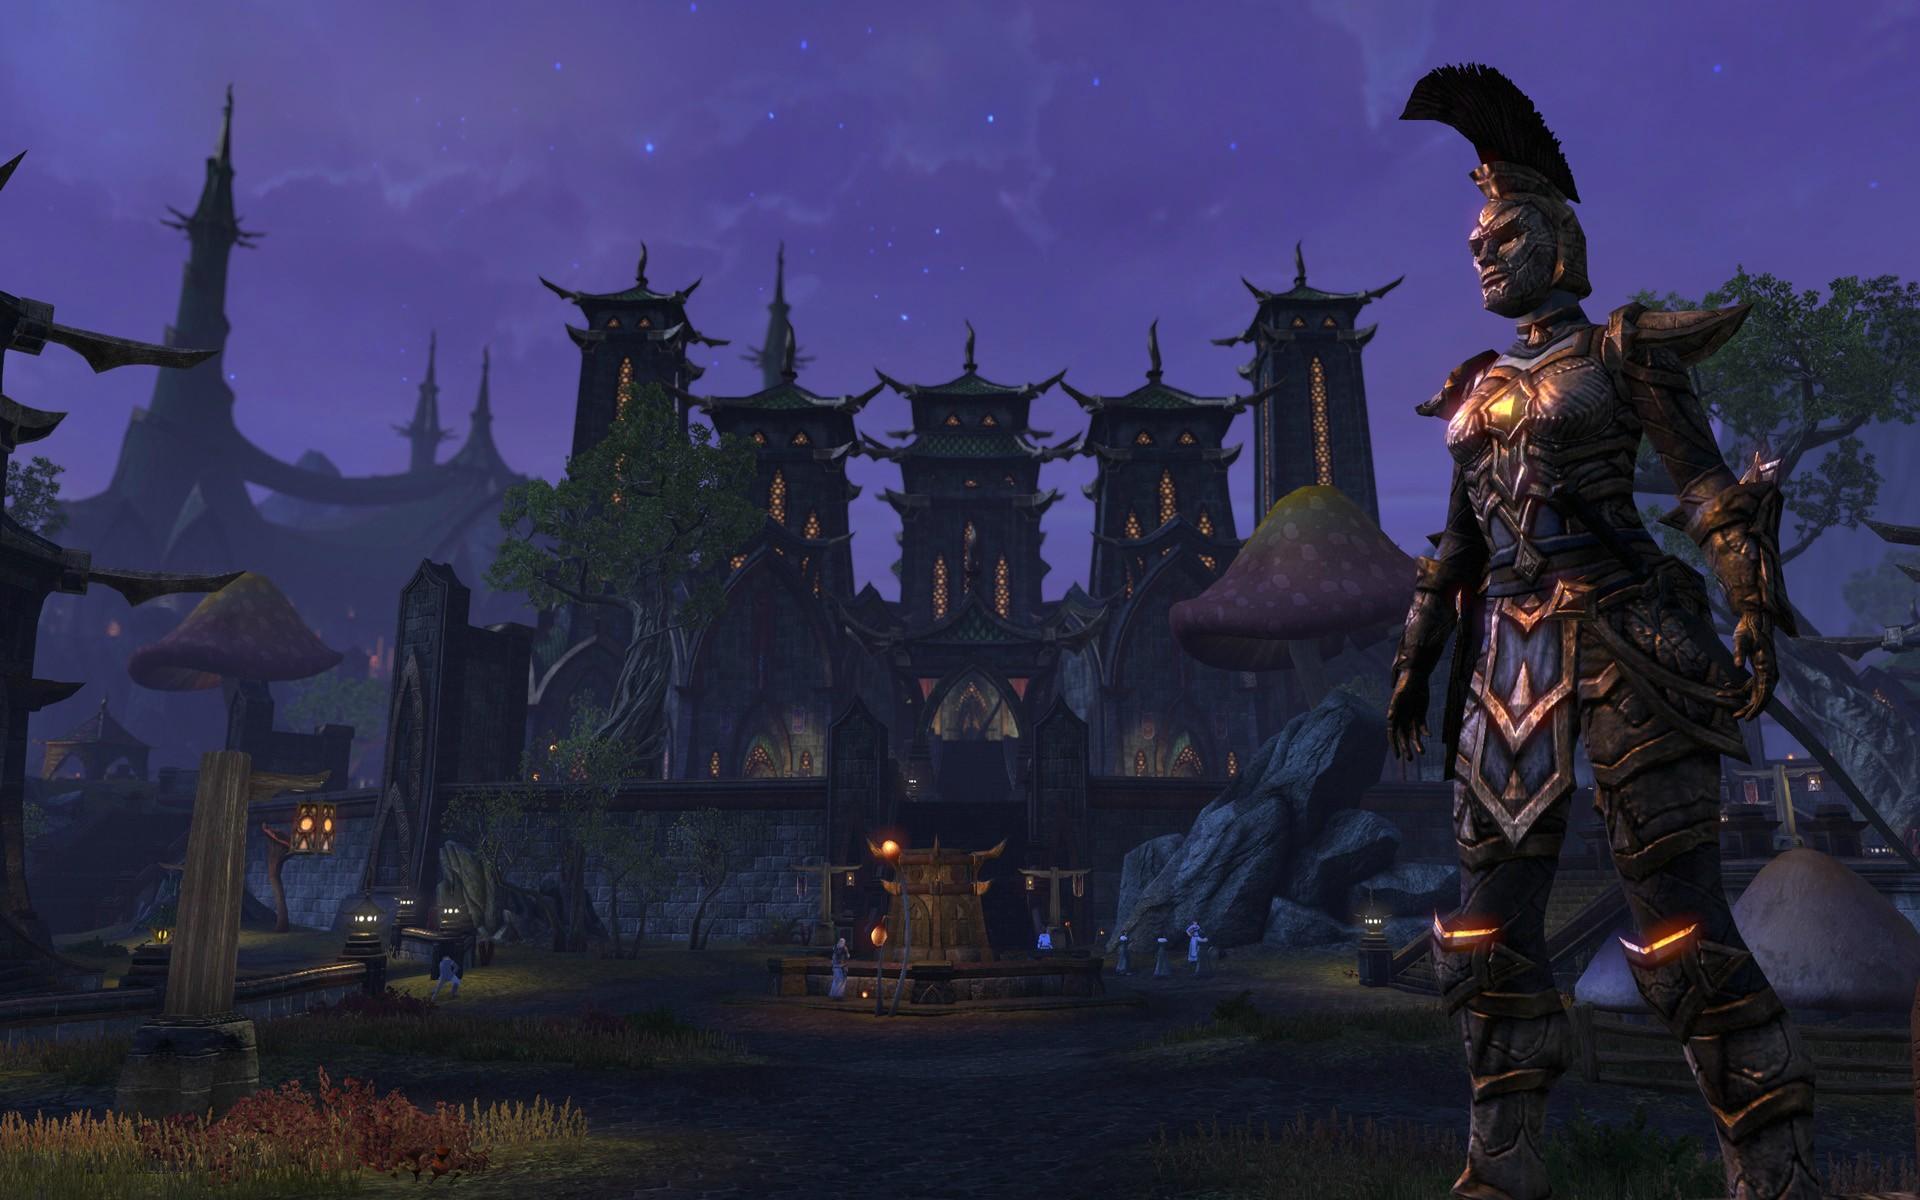 Elder scrolls 5: skyrim vr, the дата выхода, системные.